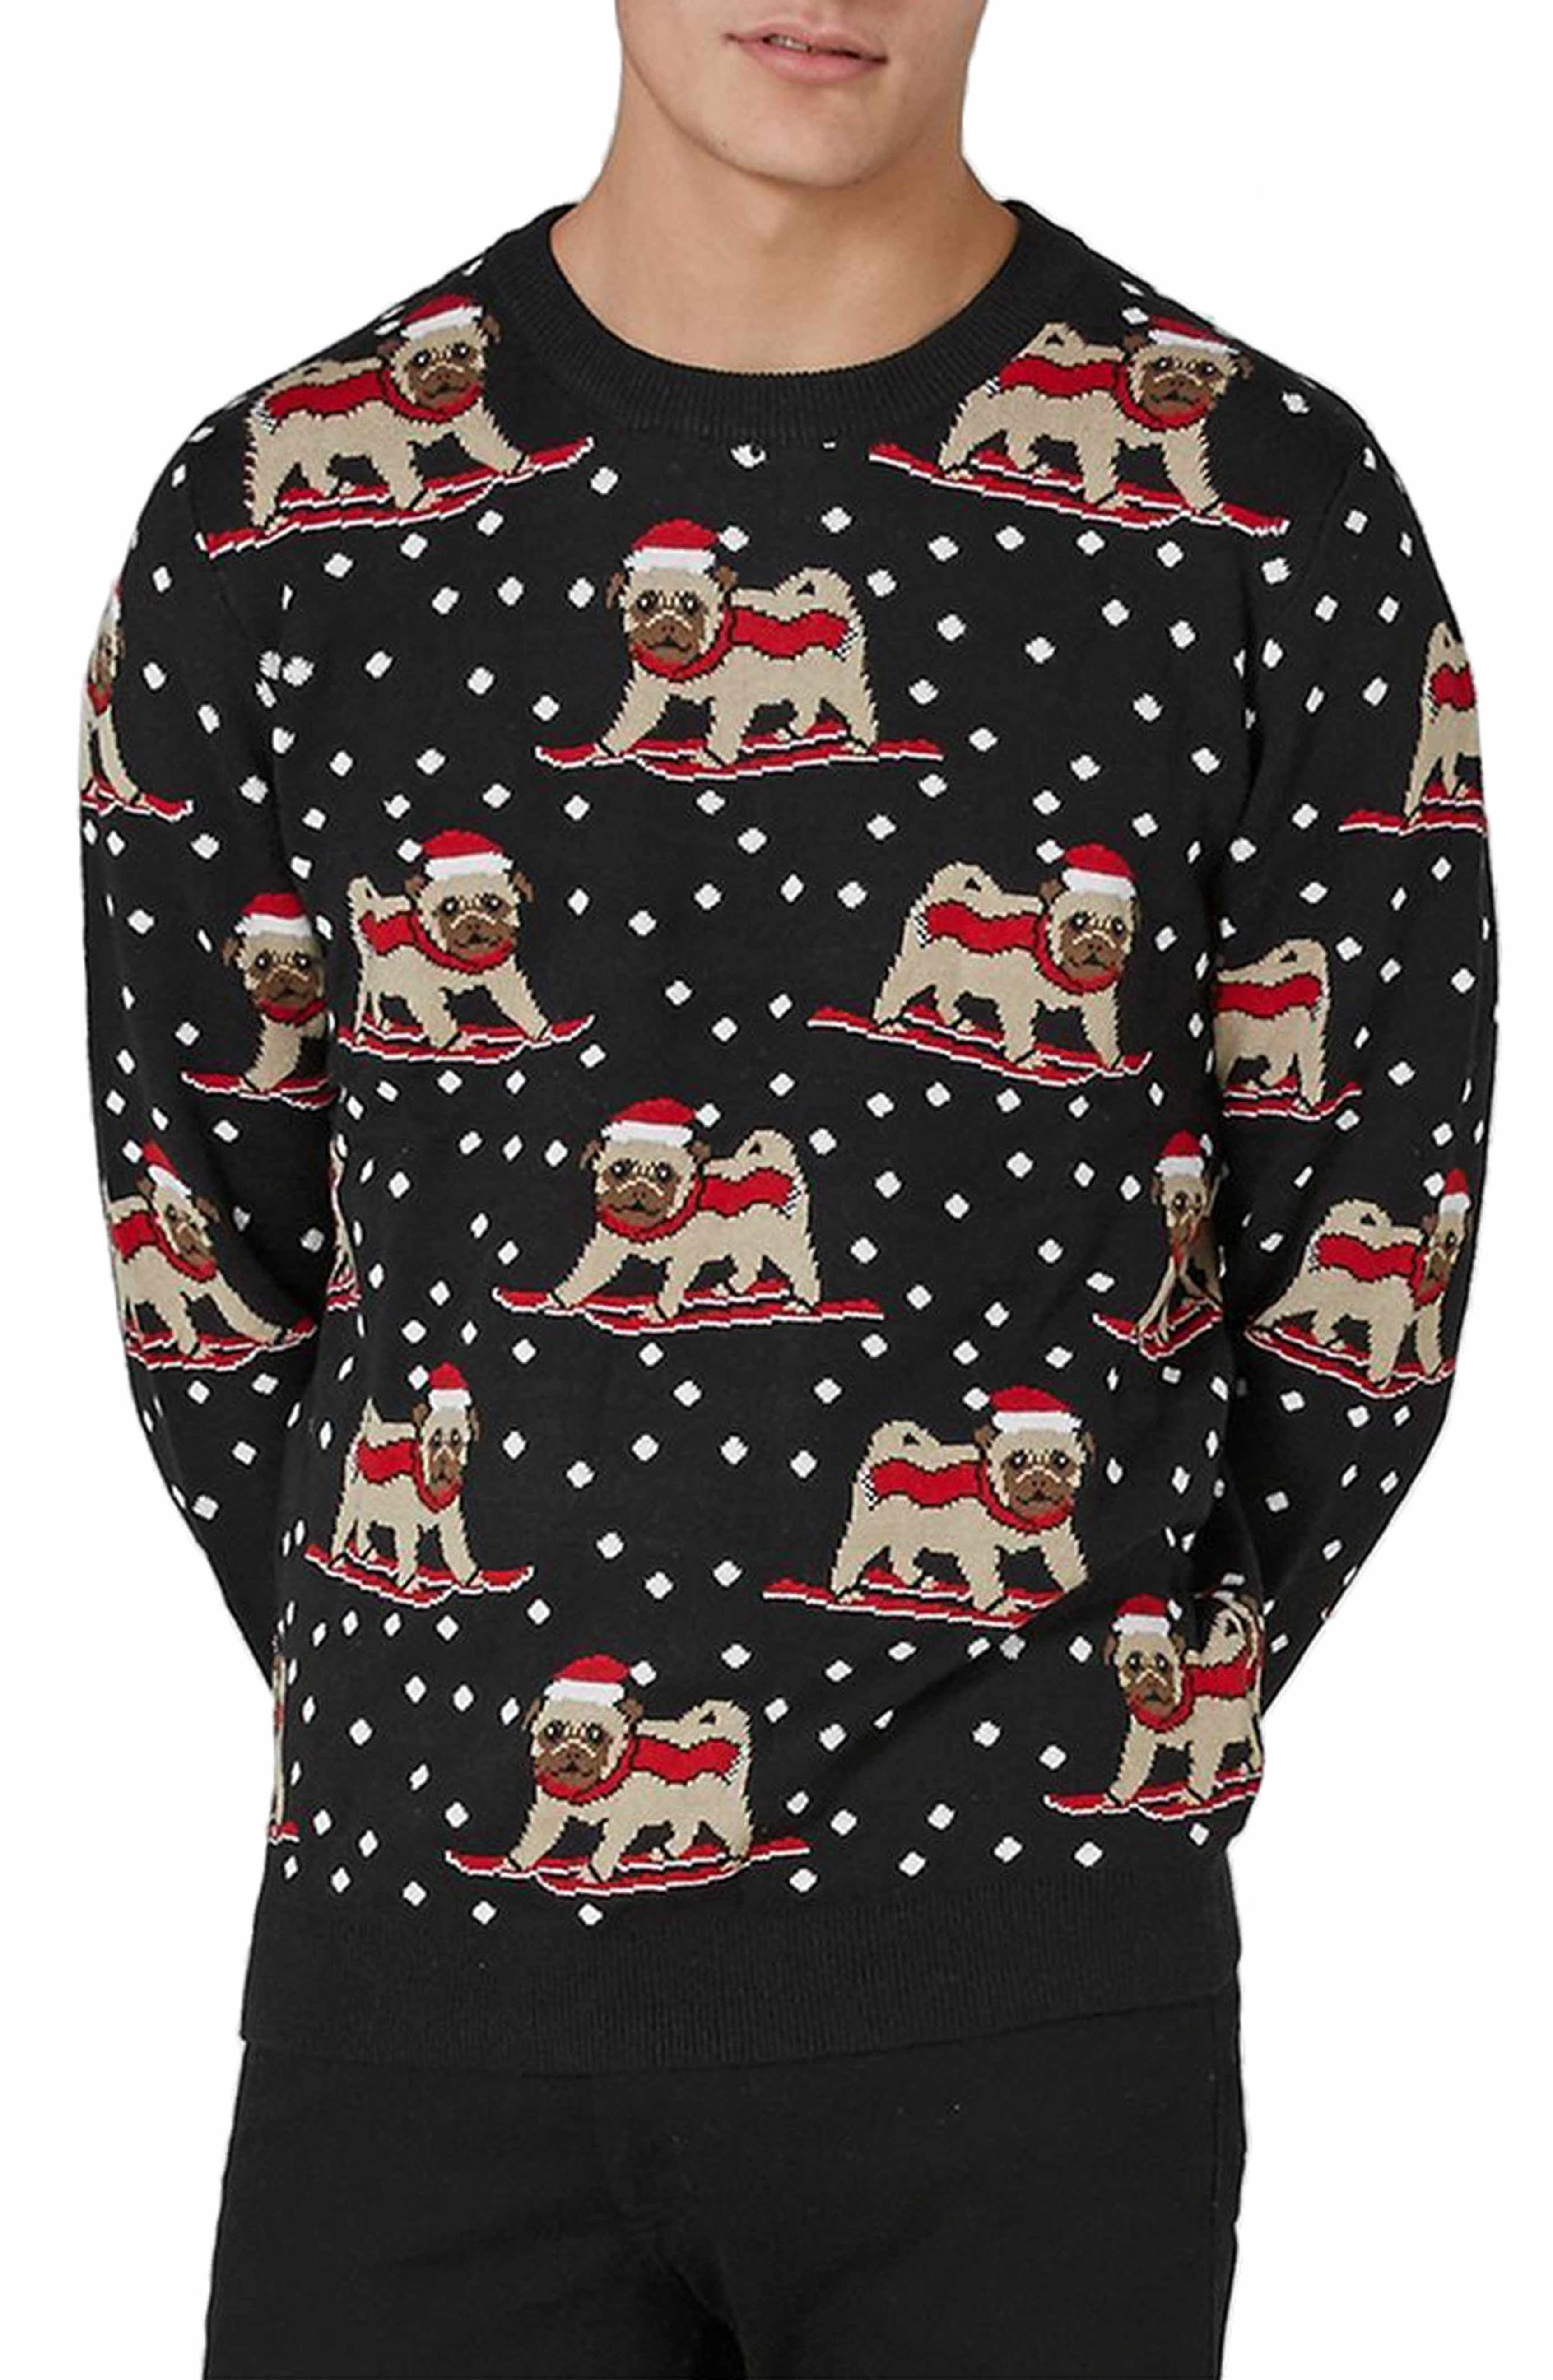 Main Image - Topman Skiing Pug Sweater | Christmas | Pinterest | Ski ...